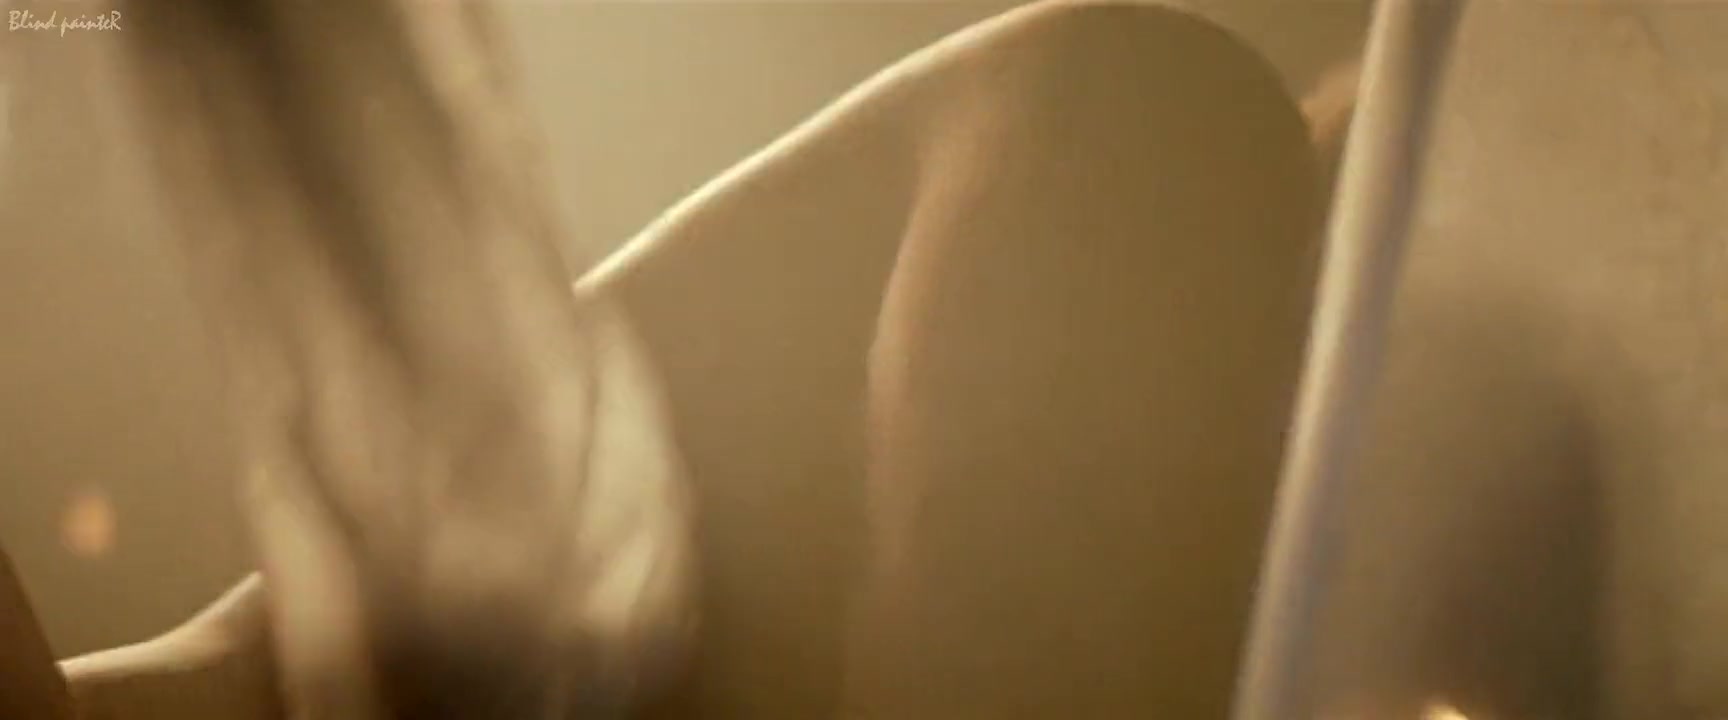 Nude photos Hamilton dating nicole